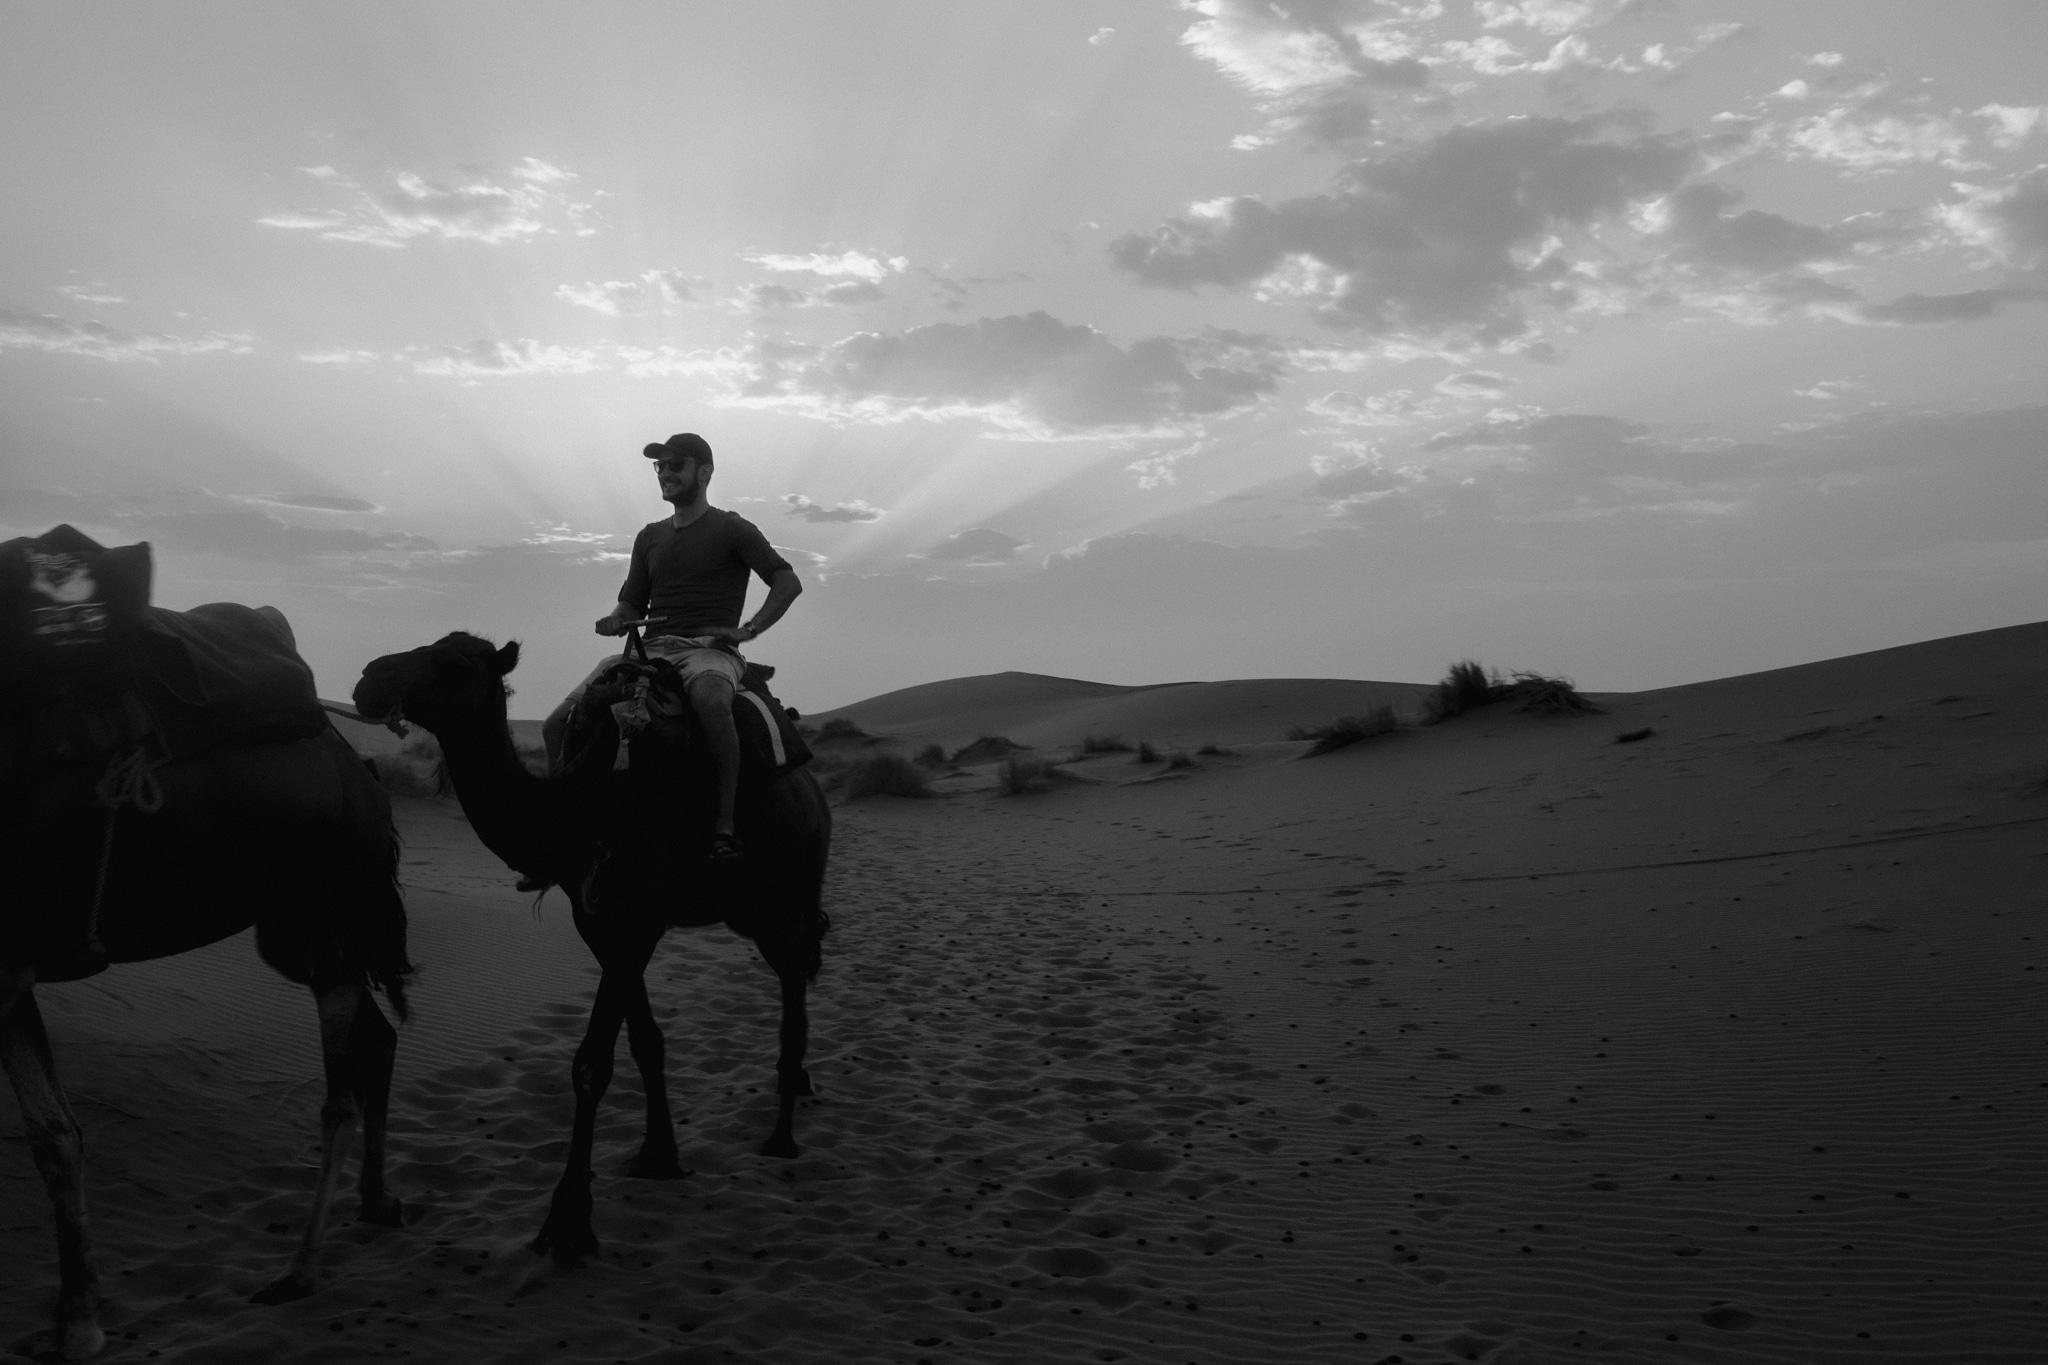 Camel ride at Erg Chebbi